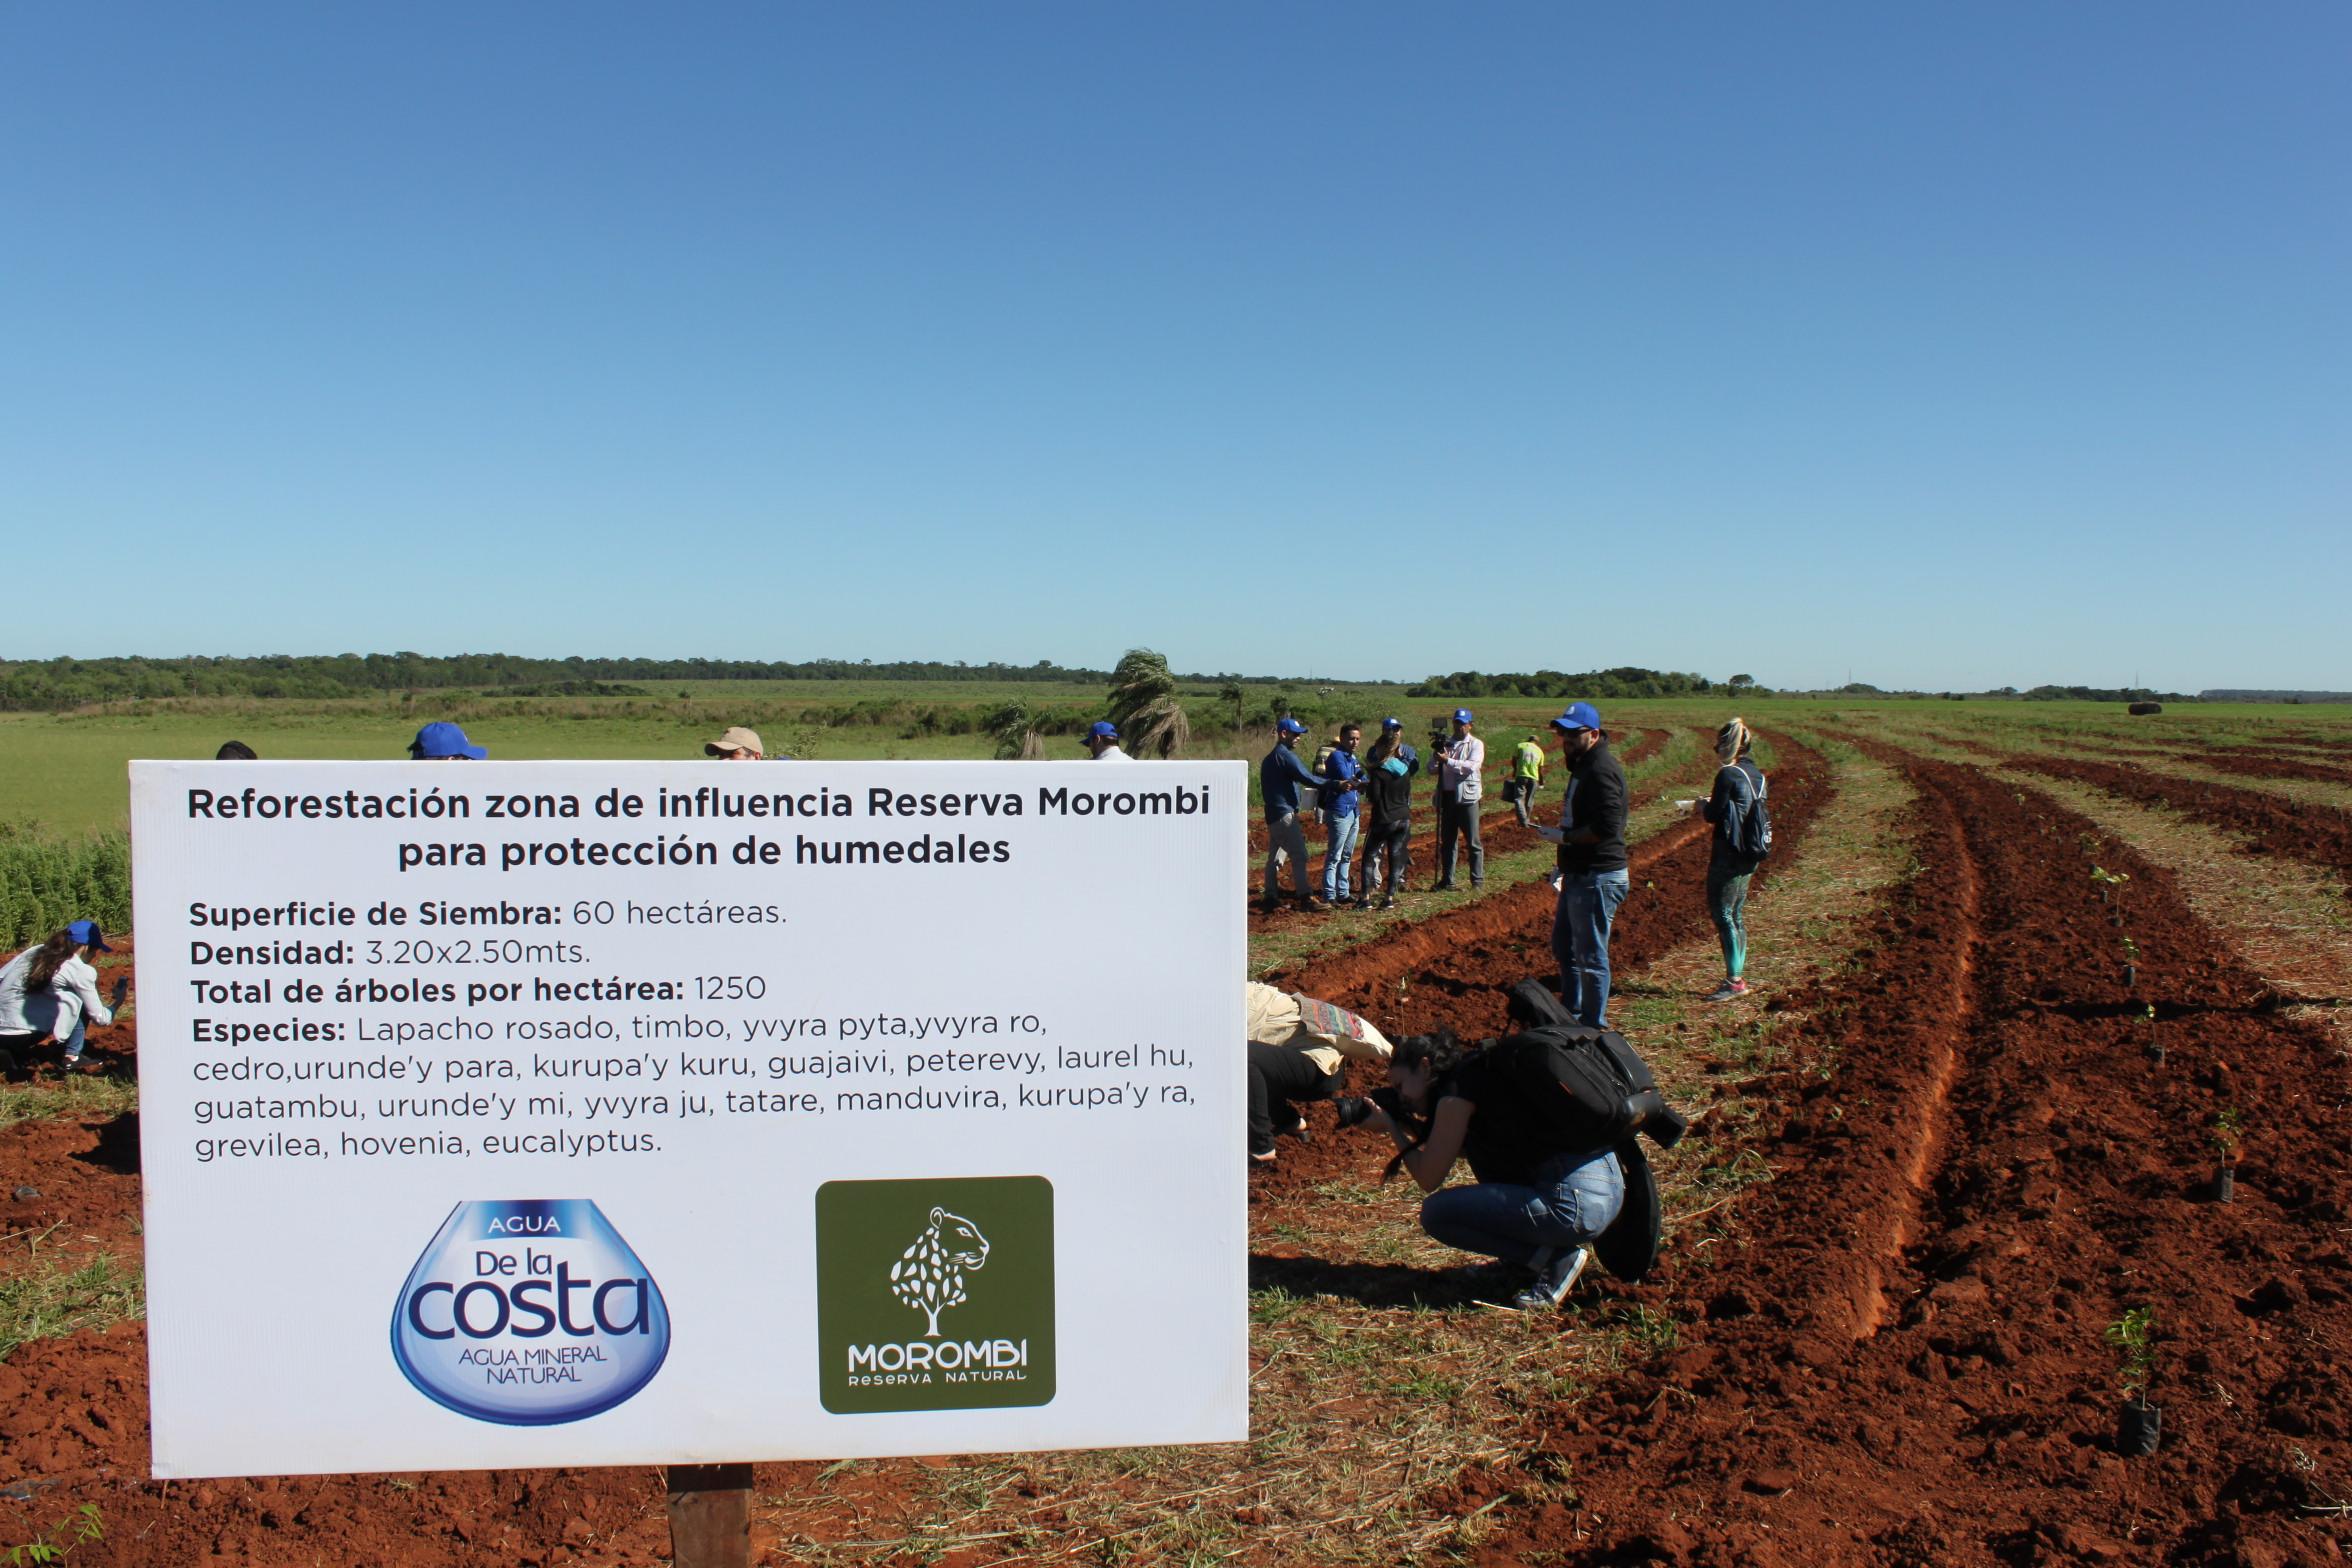 Agua de la Costa lanzó campaña de conservación de los bosques por tercer año consecutivo